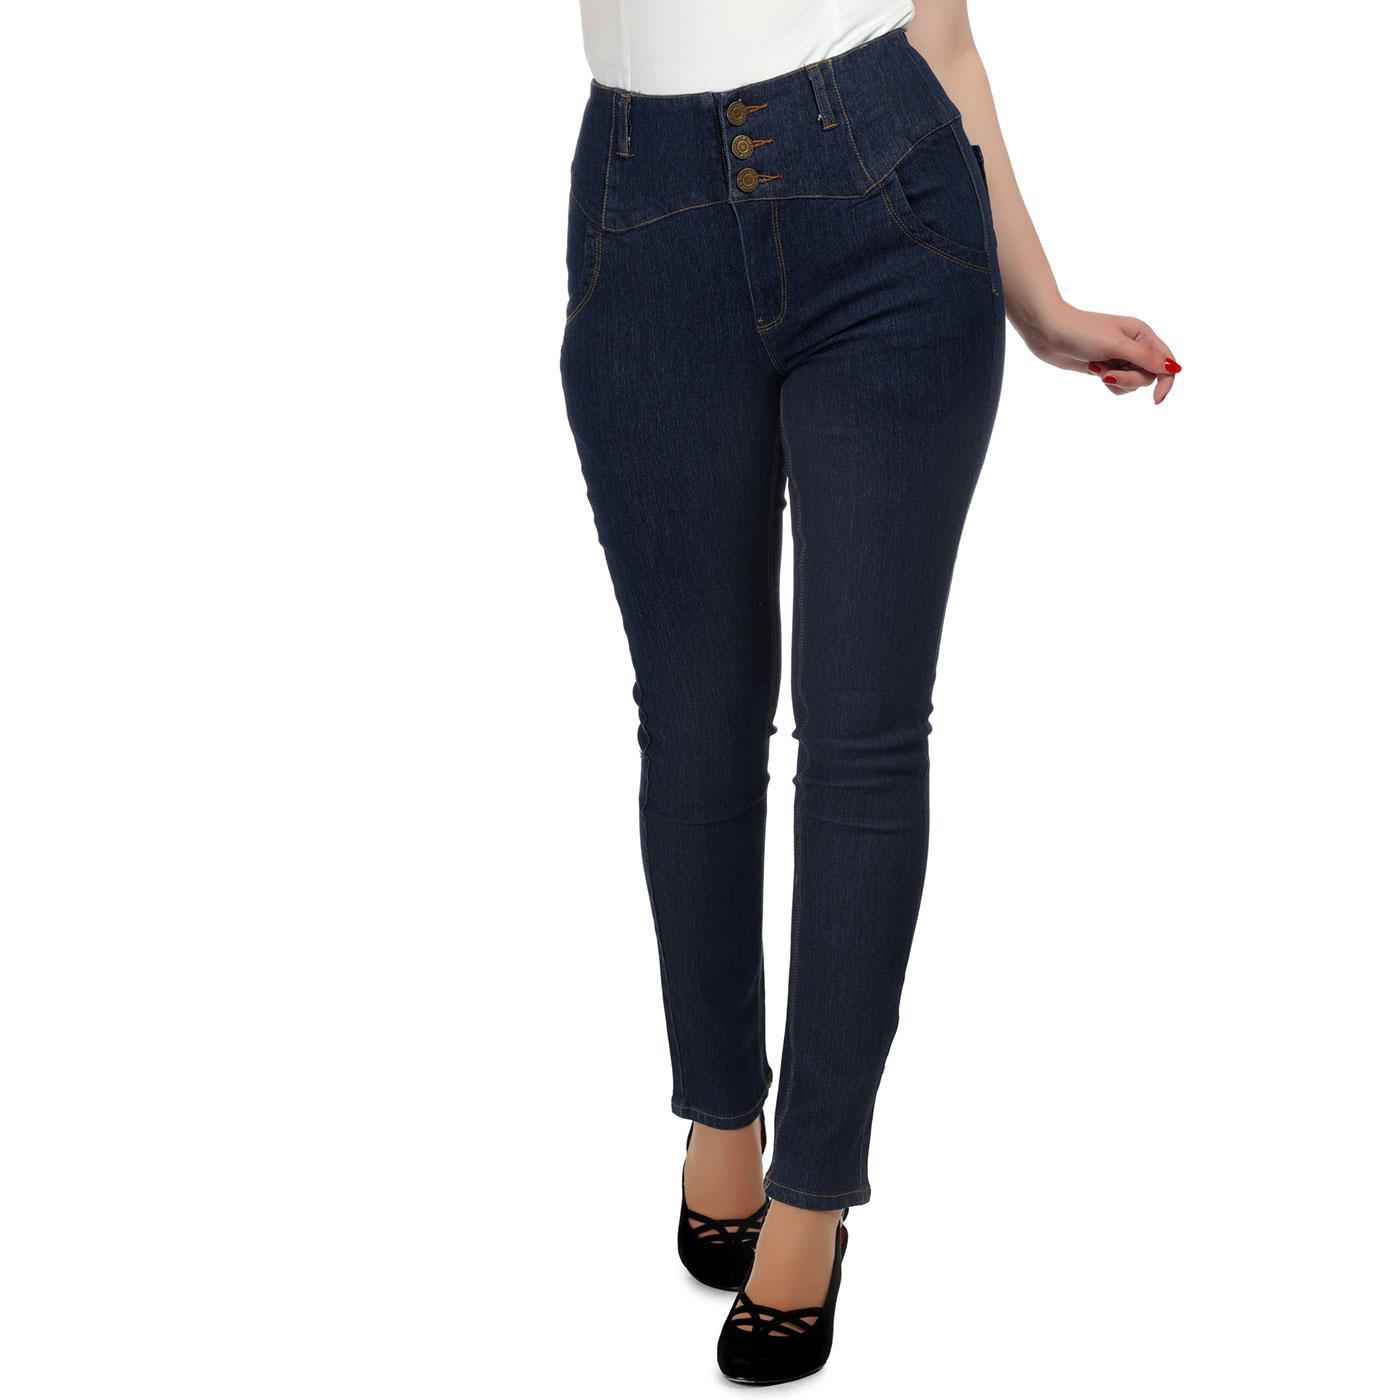 Rebel Kate COLLECTIF Retro Skinny Jeans in Navy